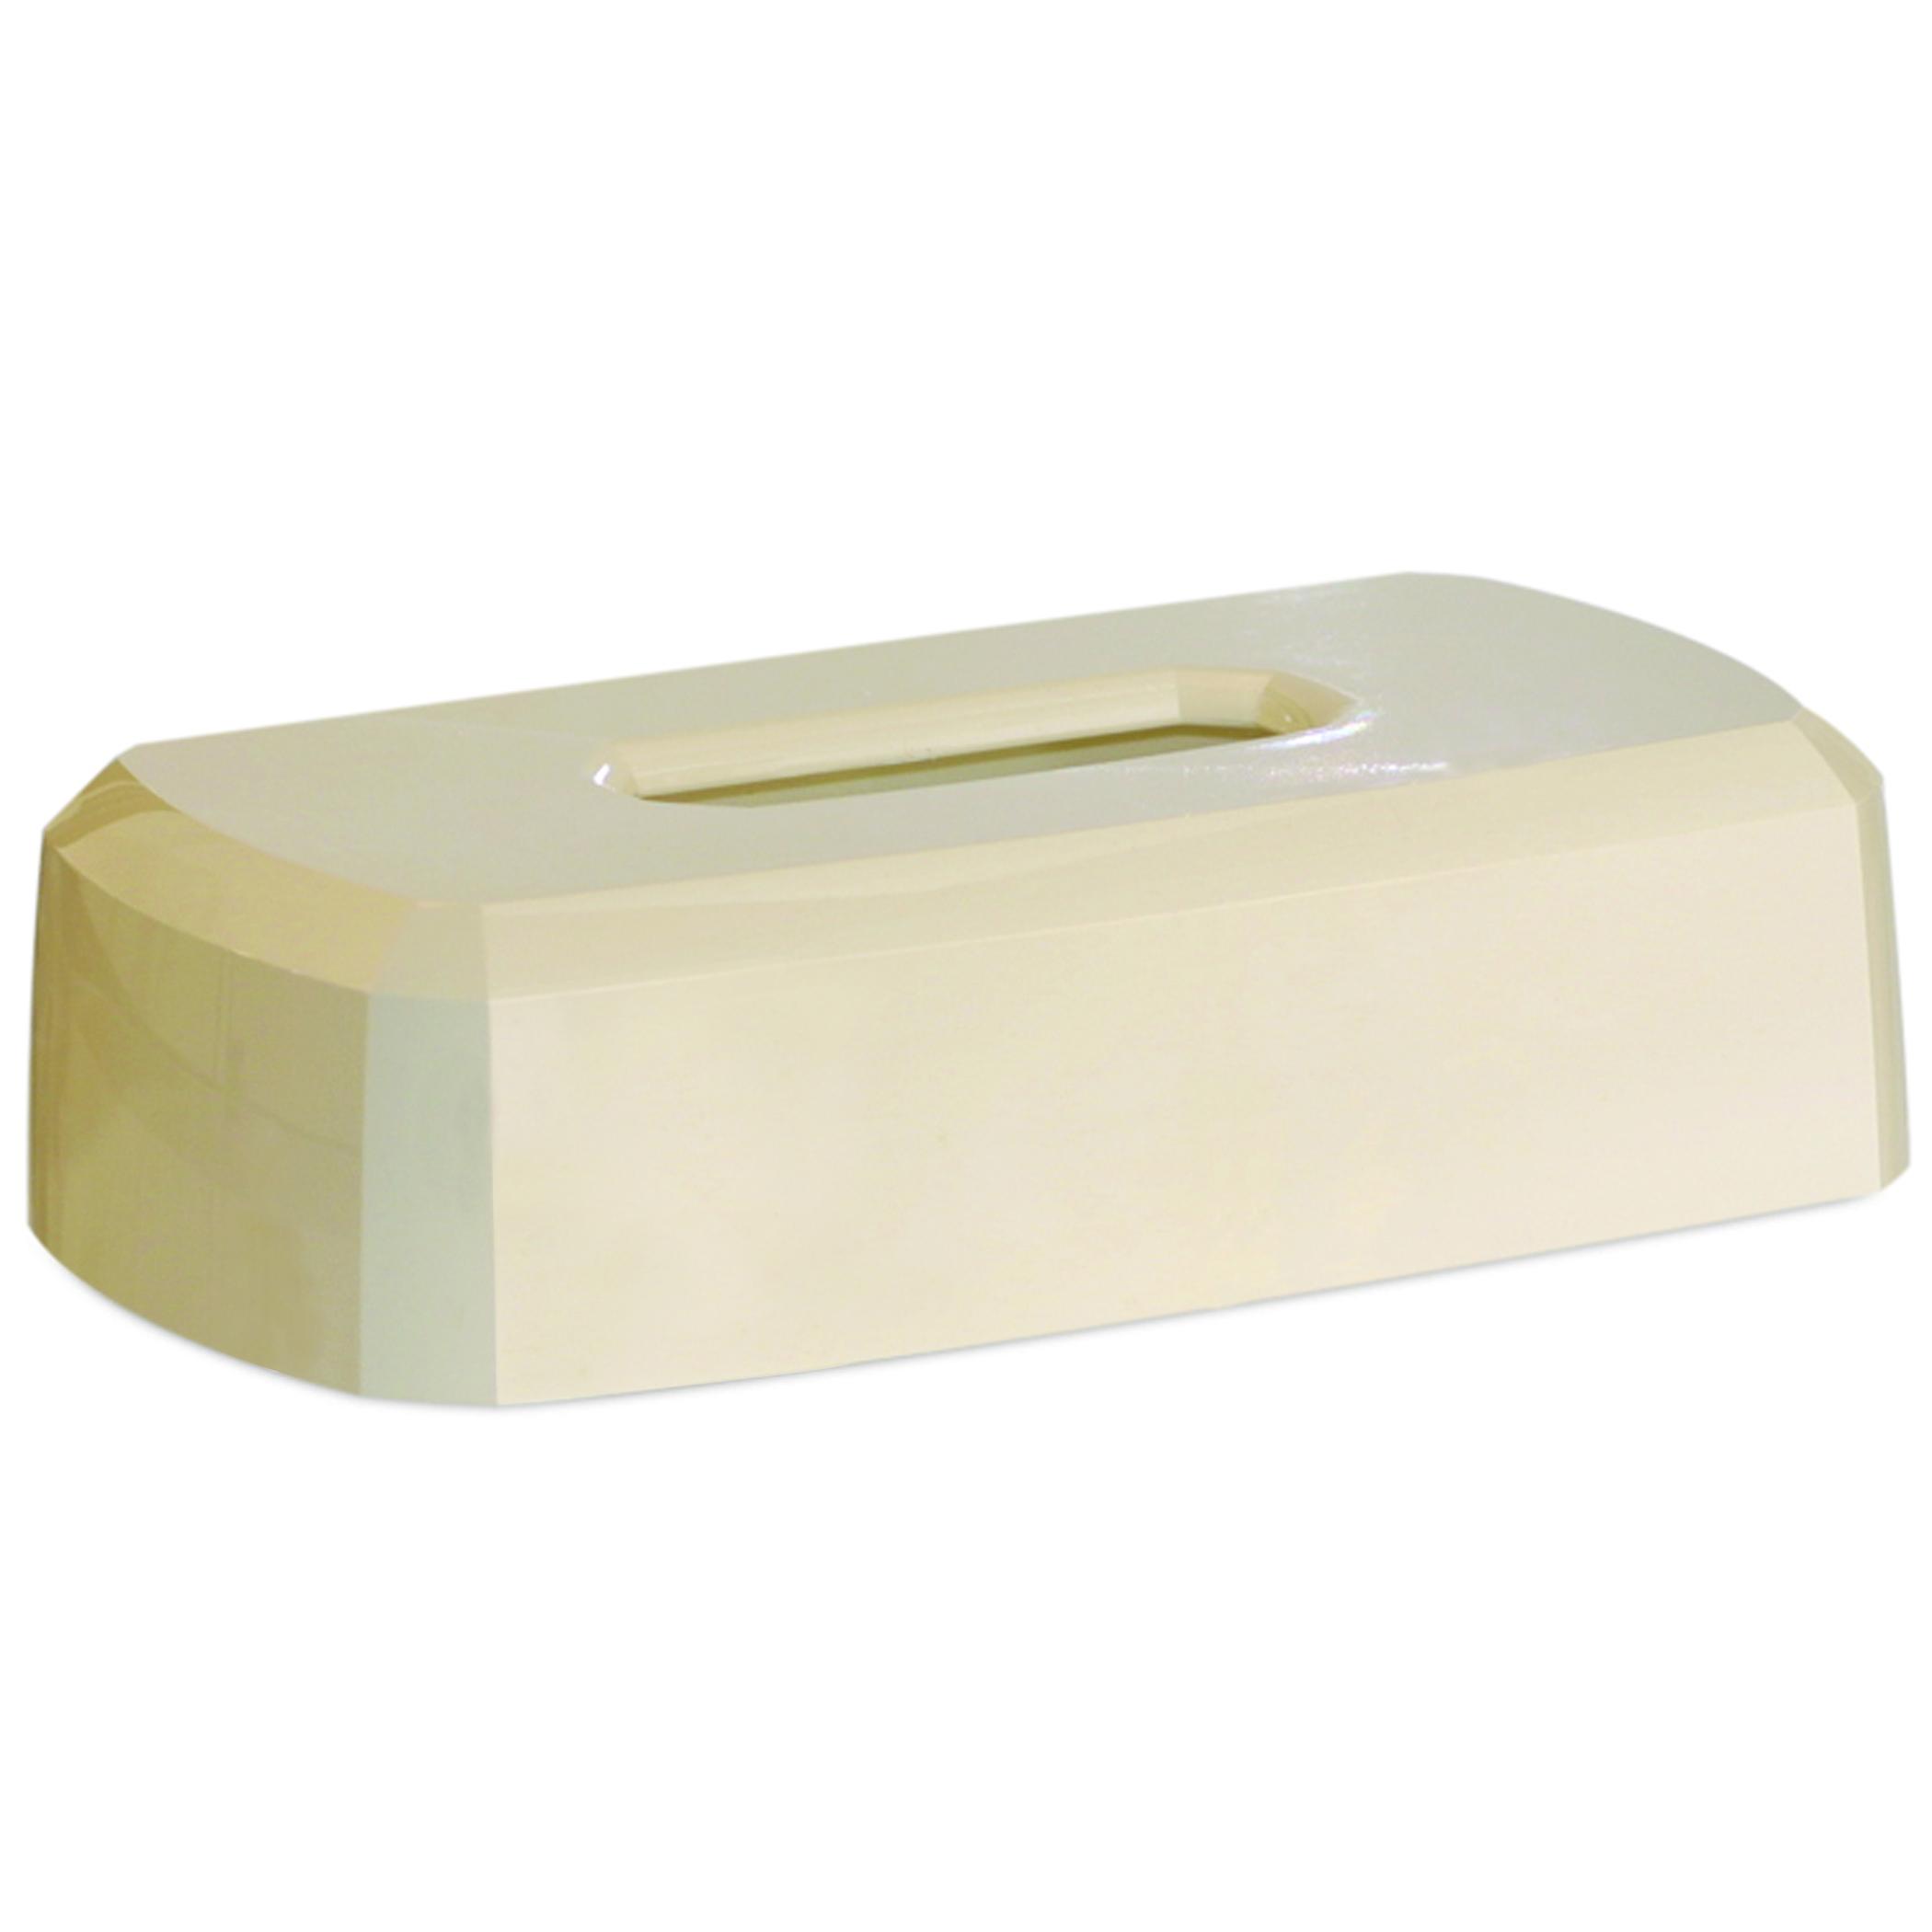 10073310574407 GP Vanilla Flat Box Facial Tissue Dispenser 5.750